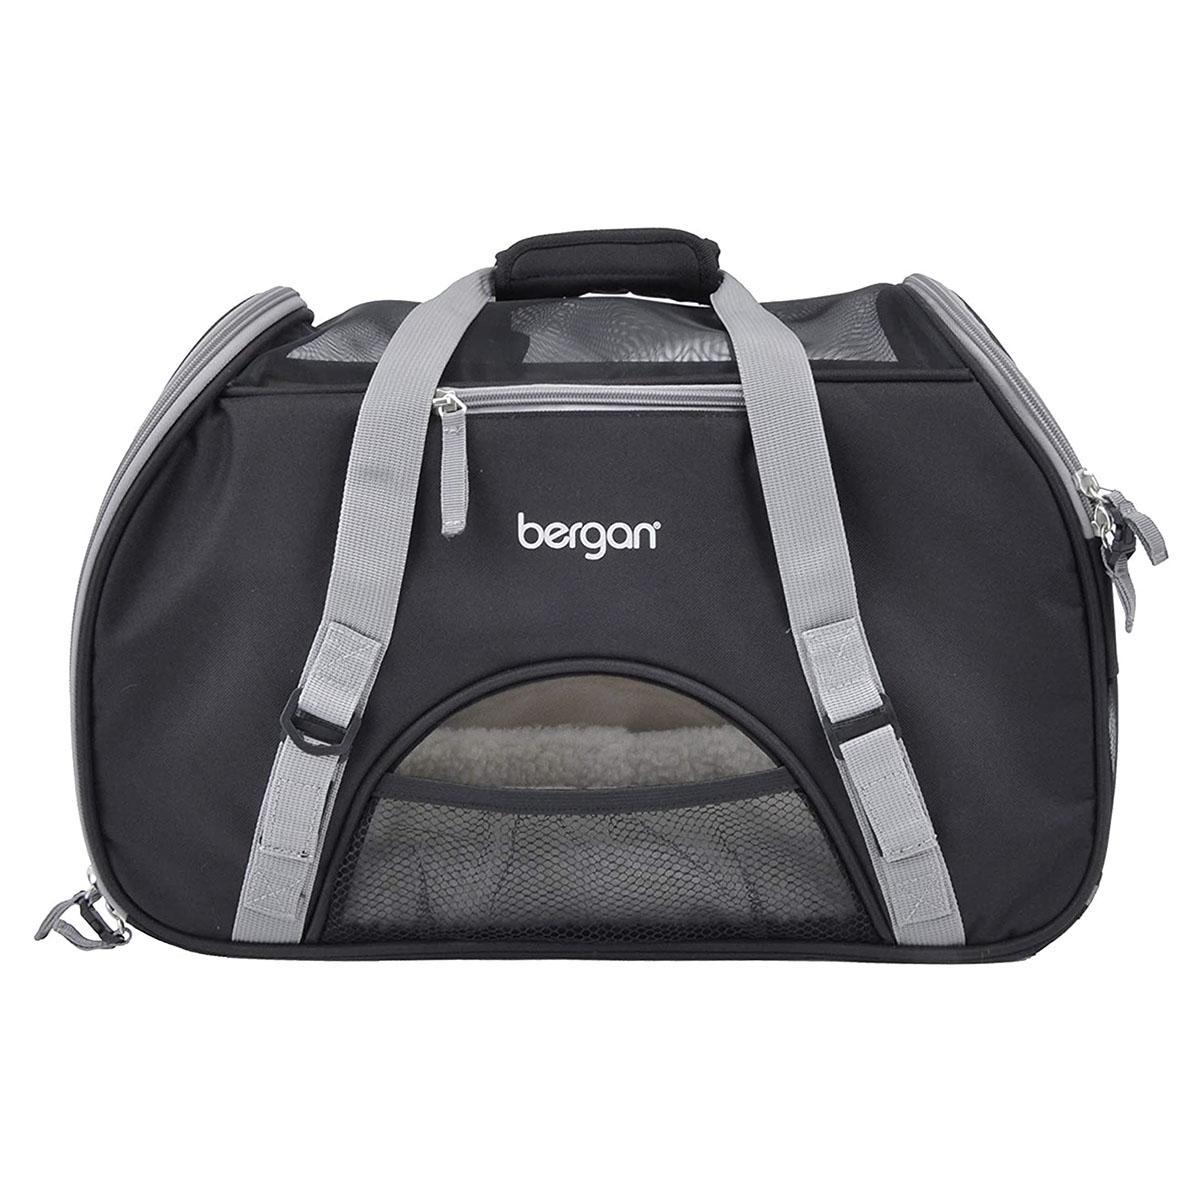 Bergan Comfort Pet Carrier - Black and Grey